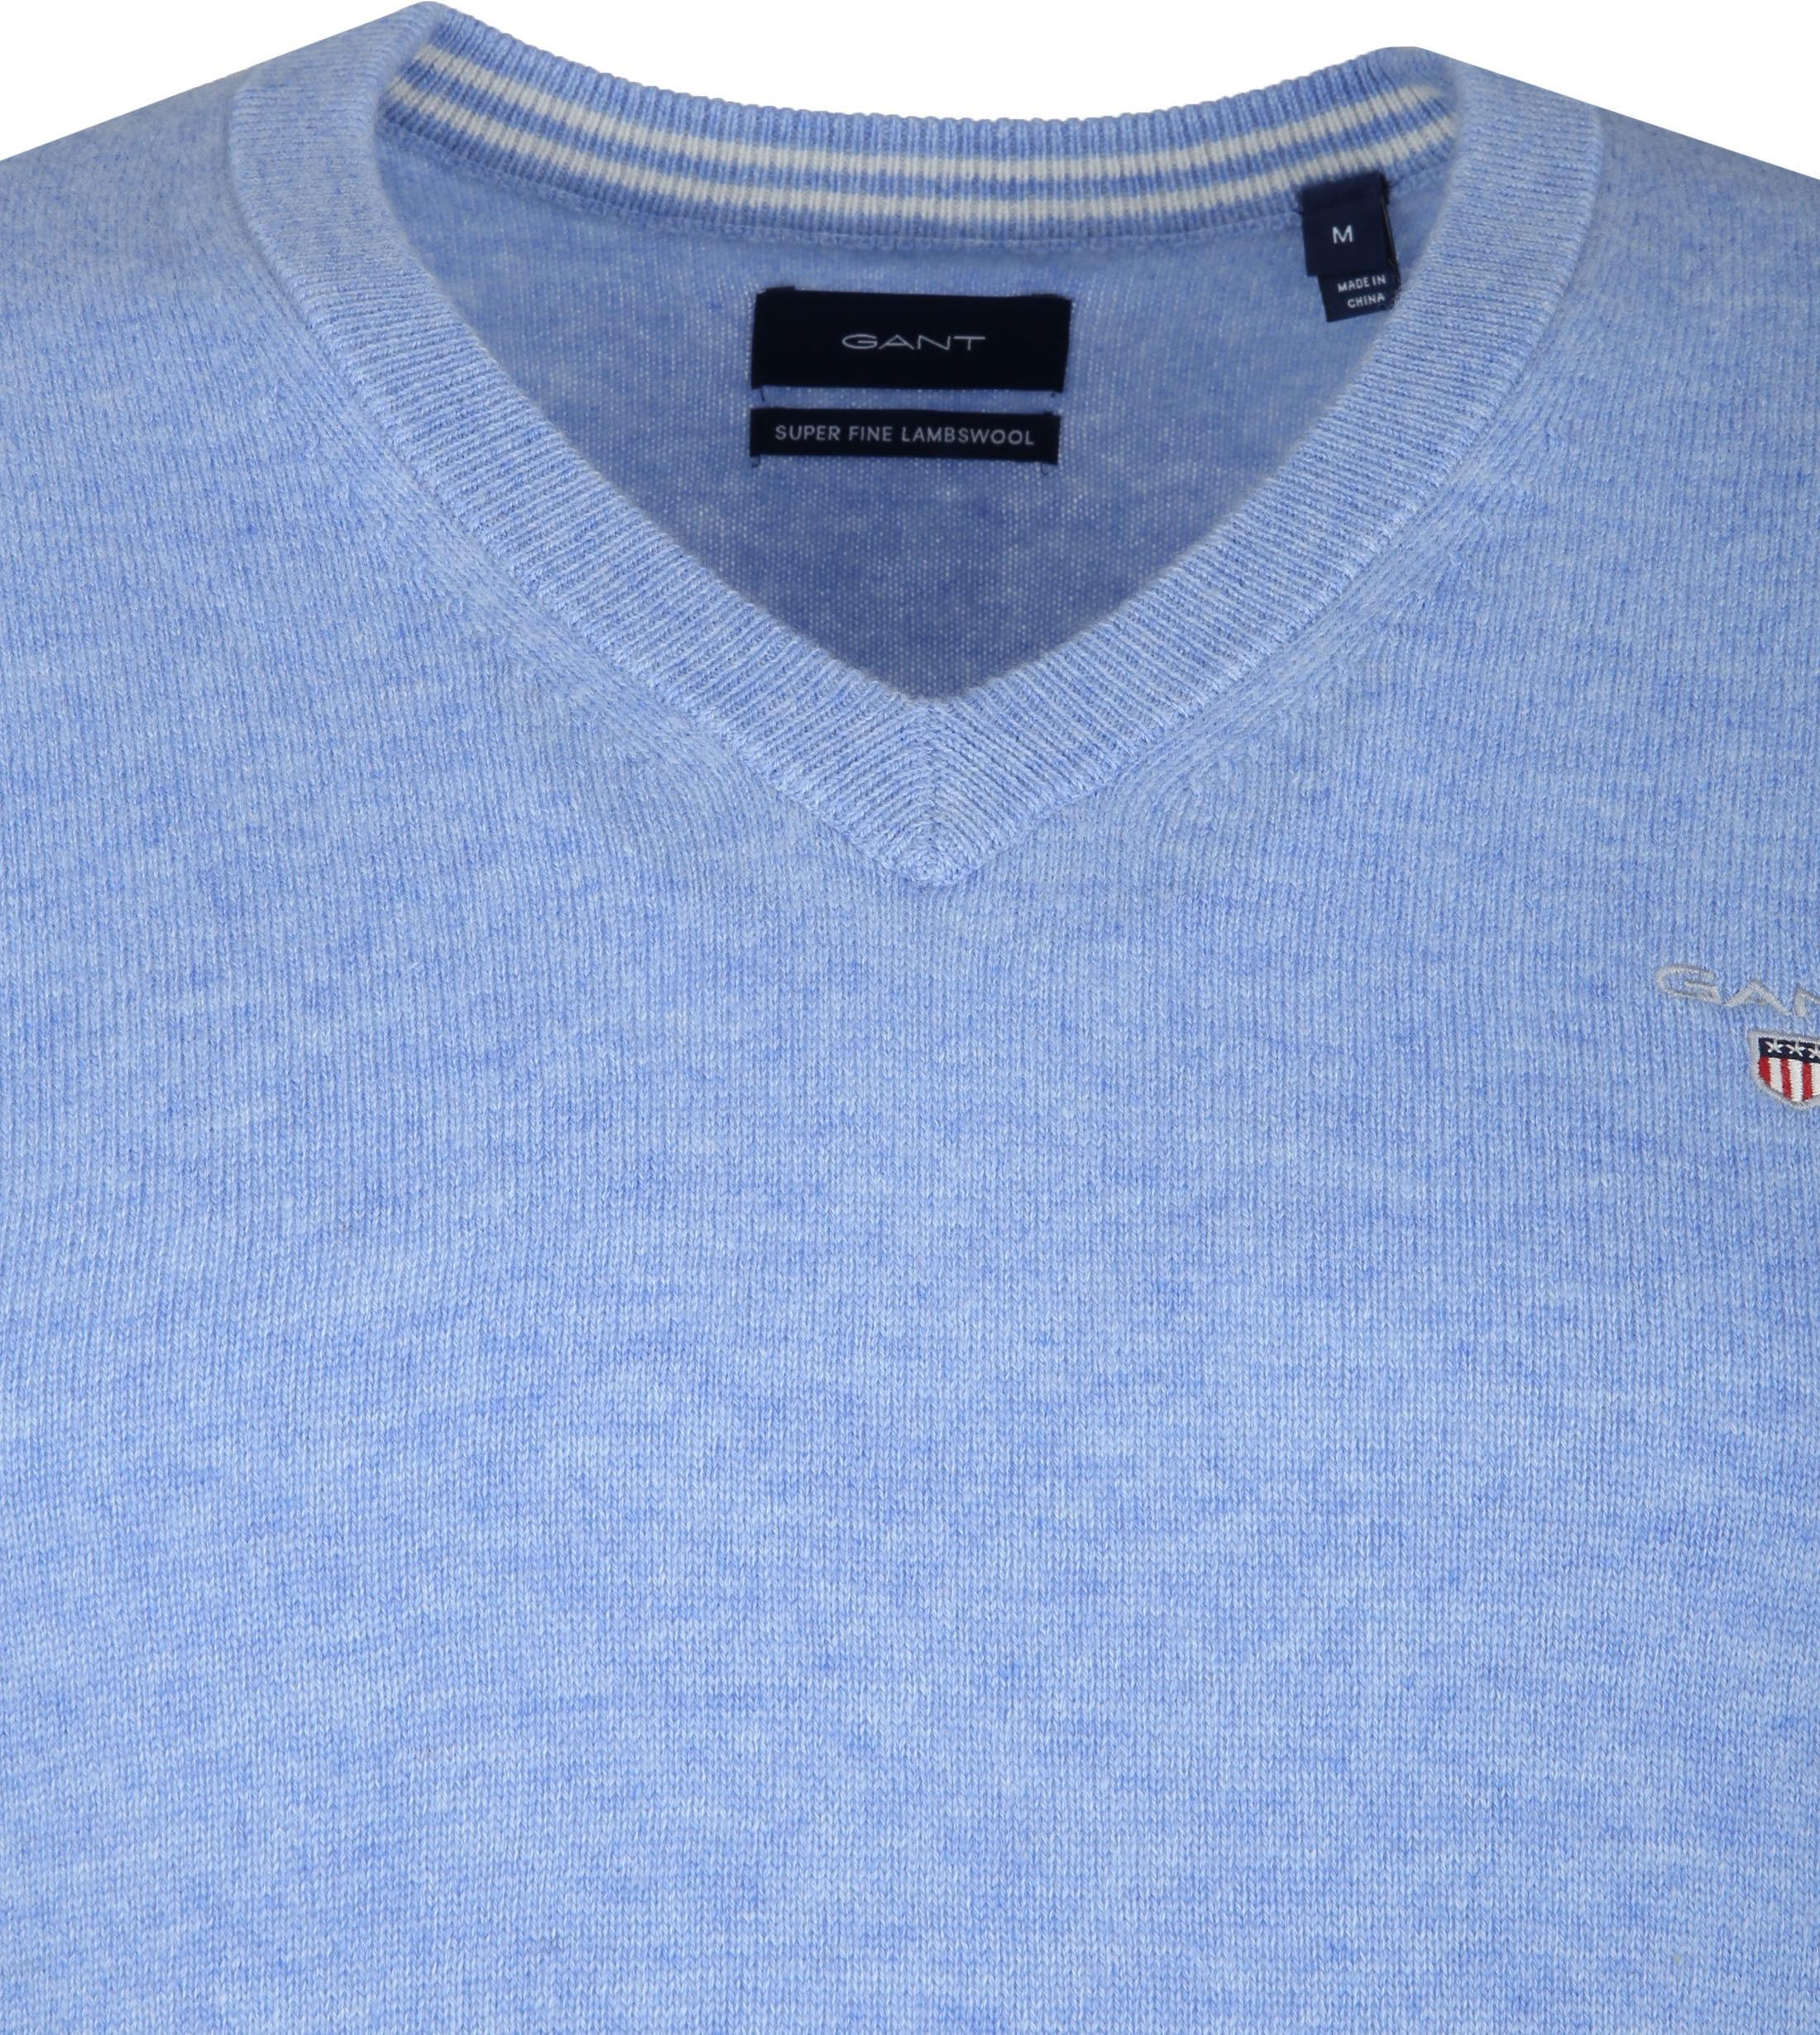 Gant Lambswool Pullover Light Blue photo 1